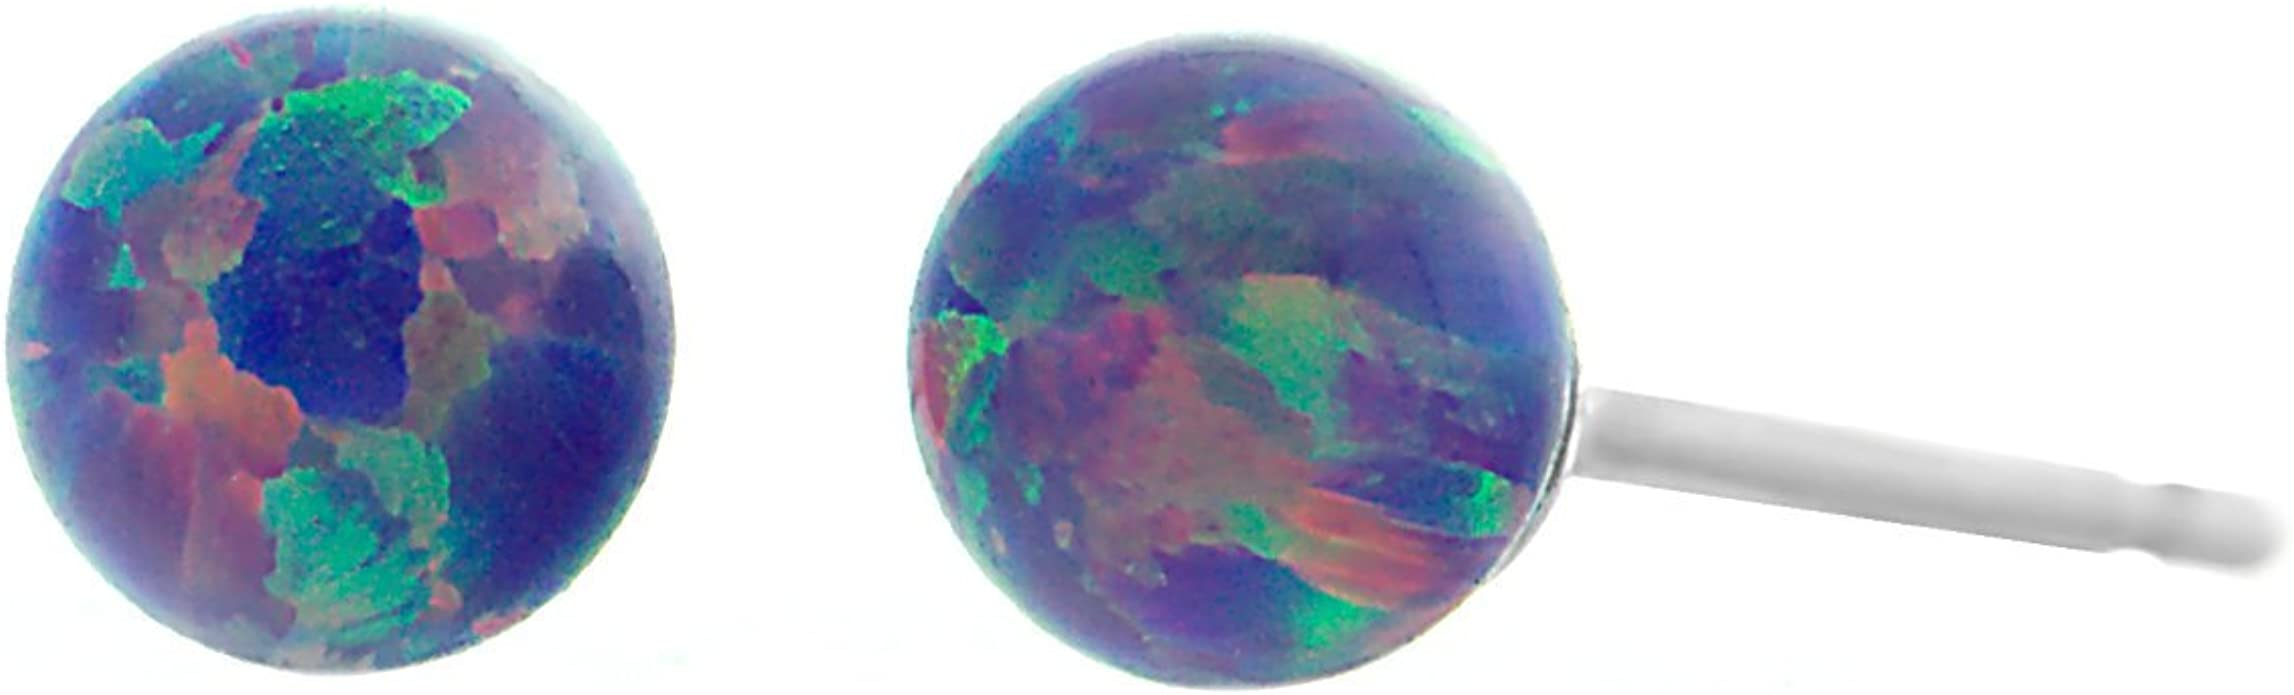 Trustmark 14-20 Gold Filled Cornflower Blue Synthetic Opal Ball Stud Post Earrings